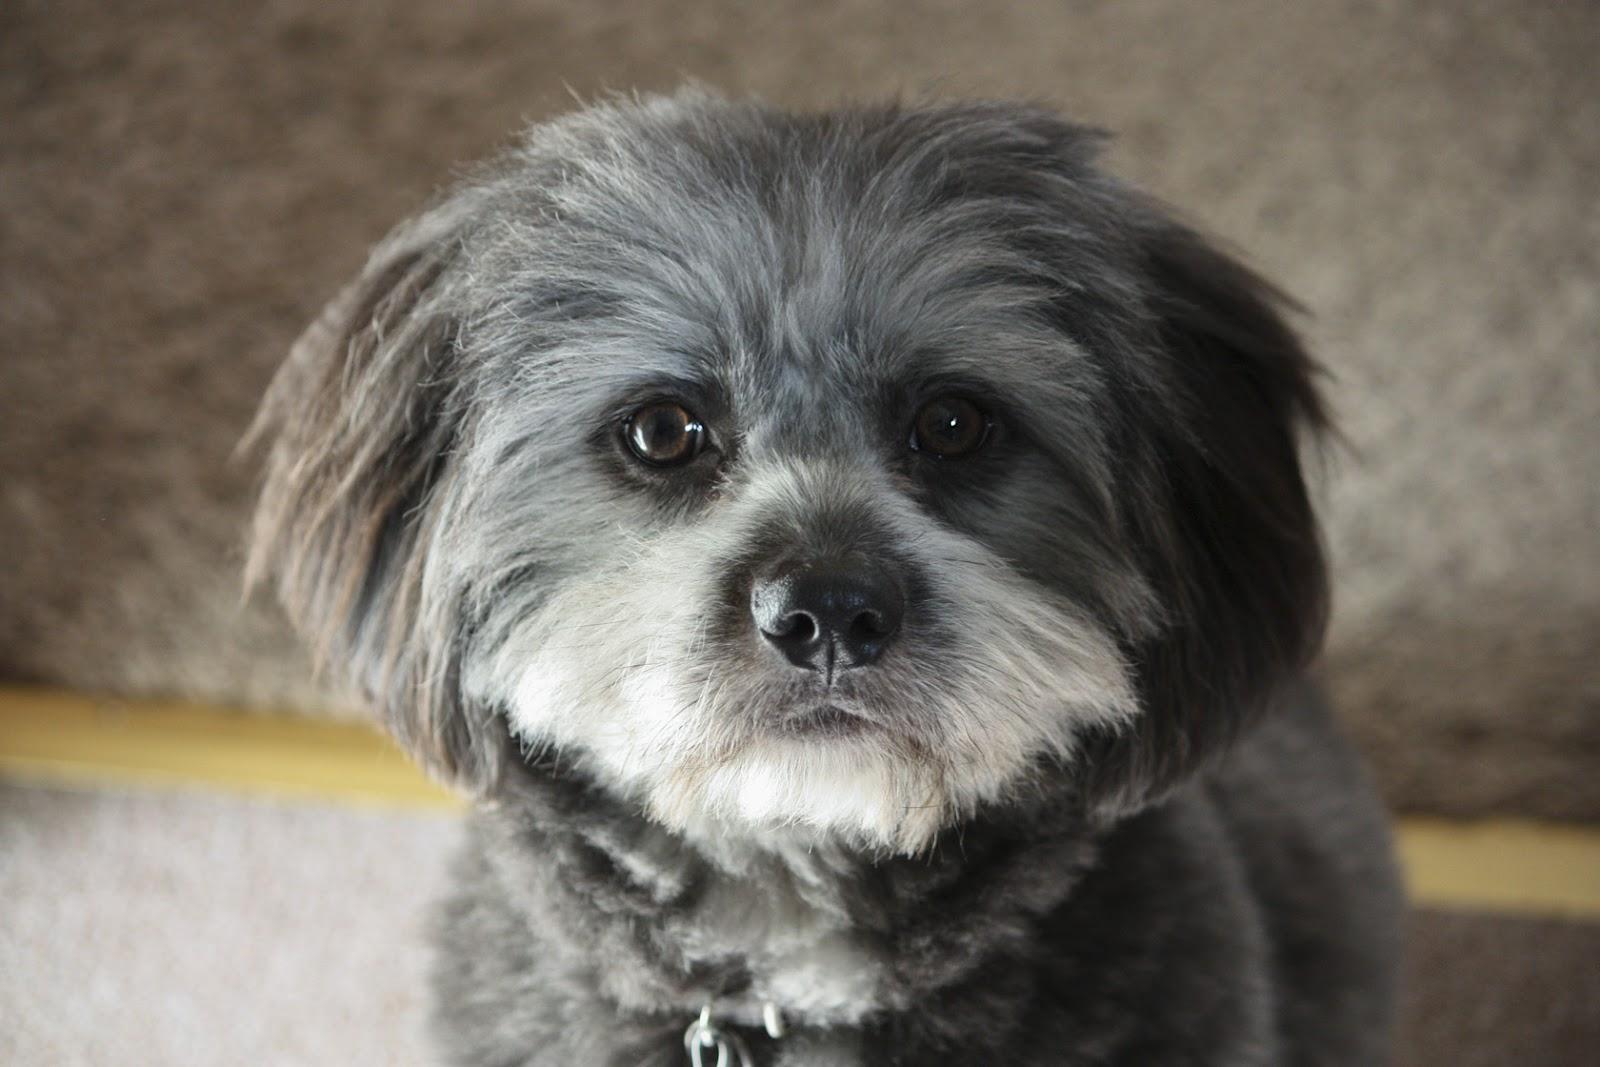 Pin Pomeranian Shih Tzu Poodle Mix on Pinterest